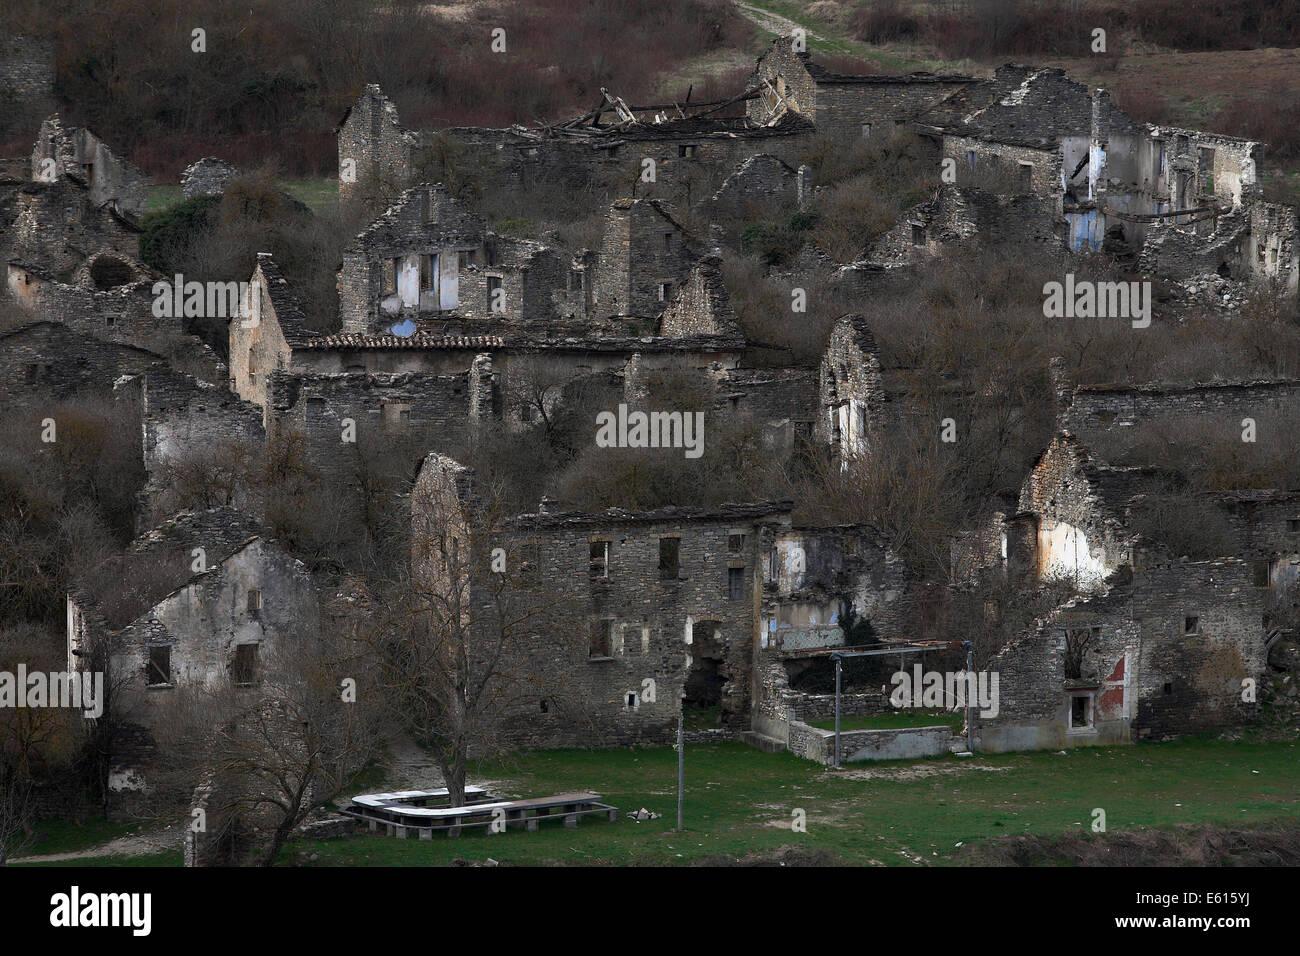 Abandoned village of Jánovas, evacuated by dictator Franco, Pyrenees, Spain - Stock Image